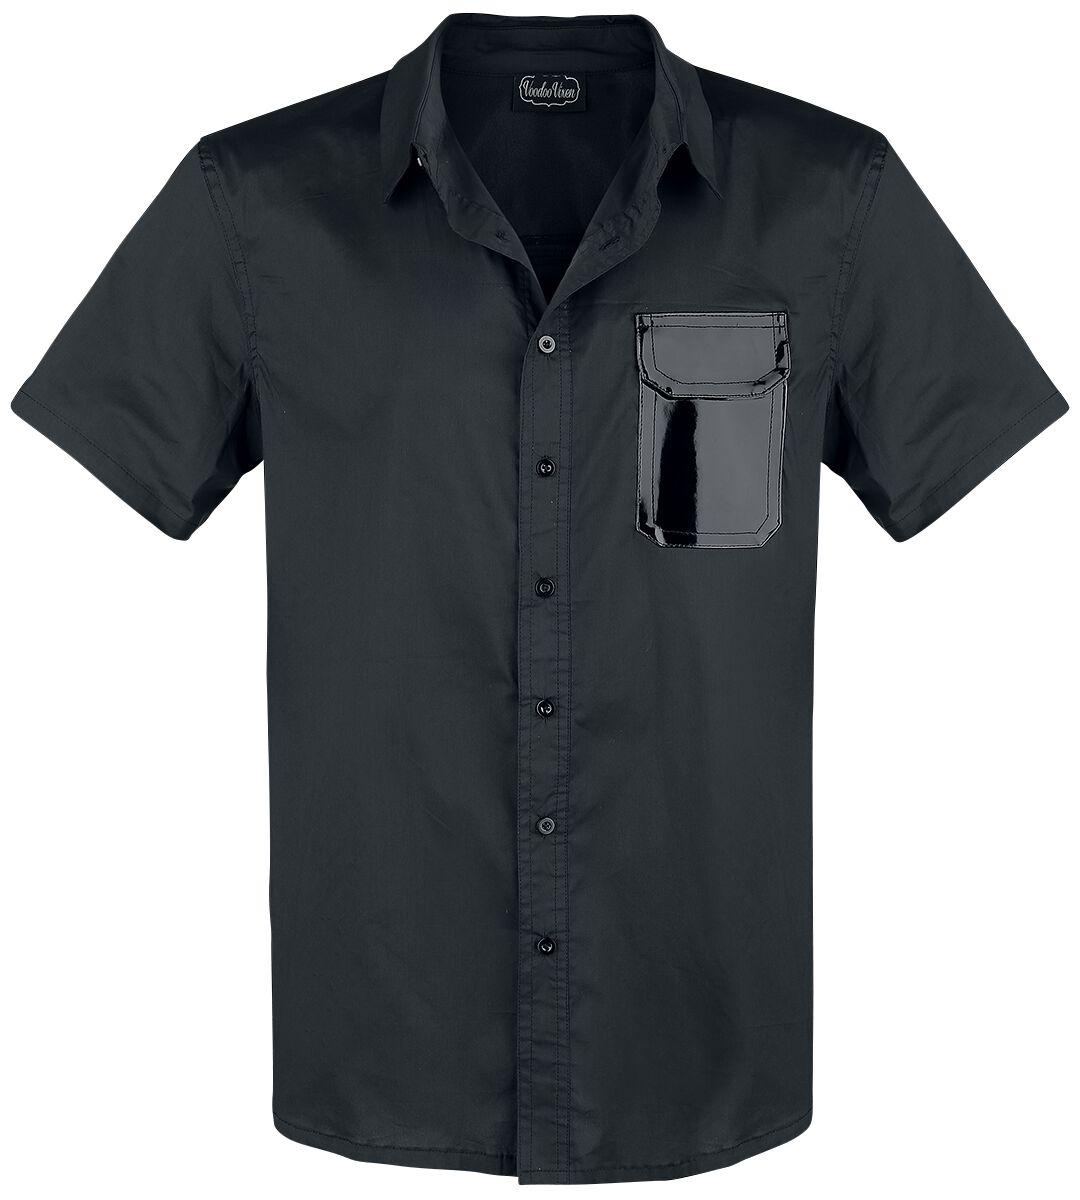 Marki - Koszule z krótkim rękawem - Workershirt Jawbreaker Black Eye Workershirt czarny - 367902